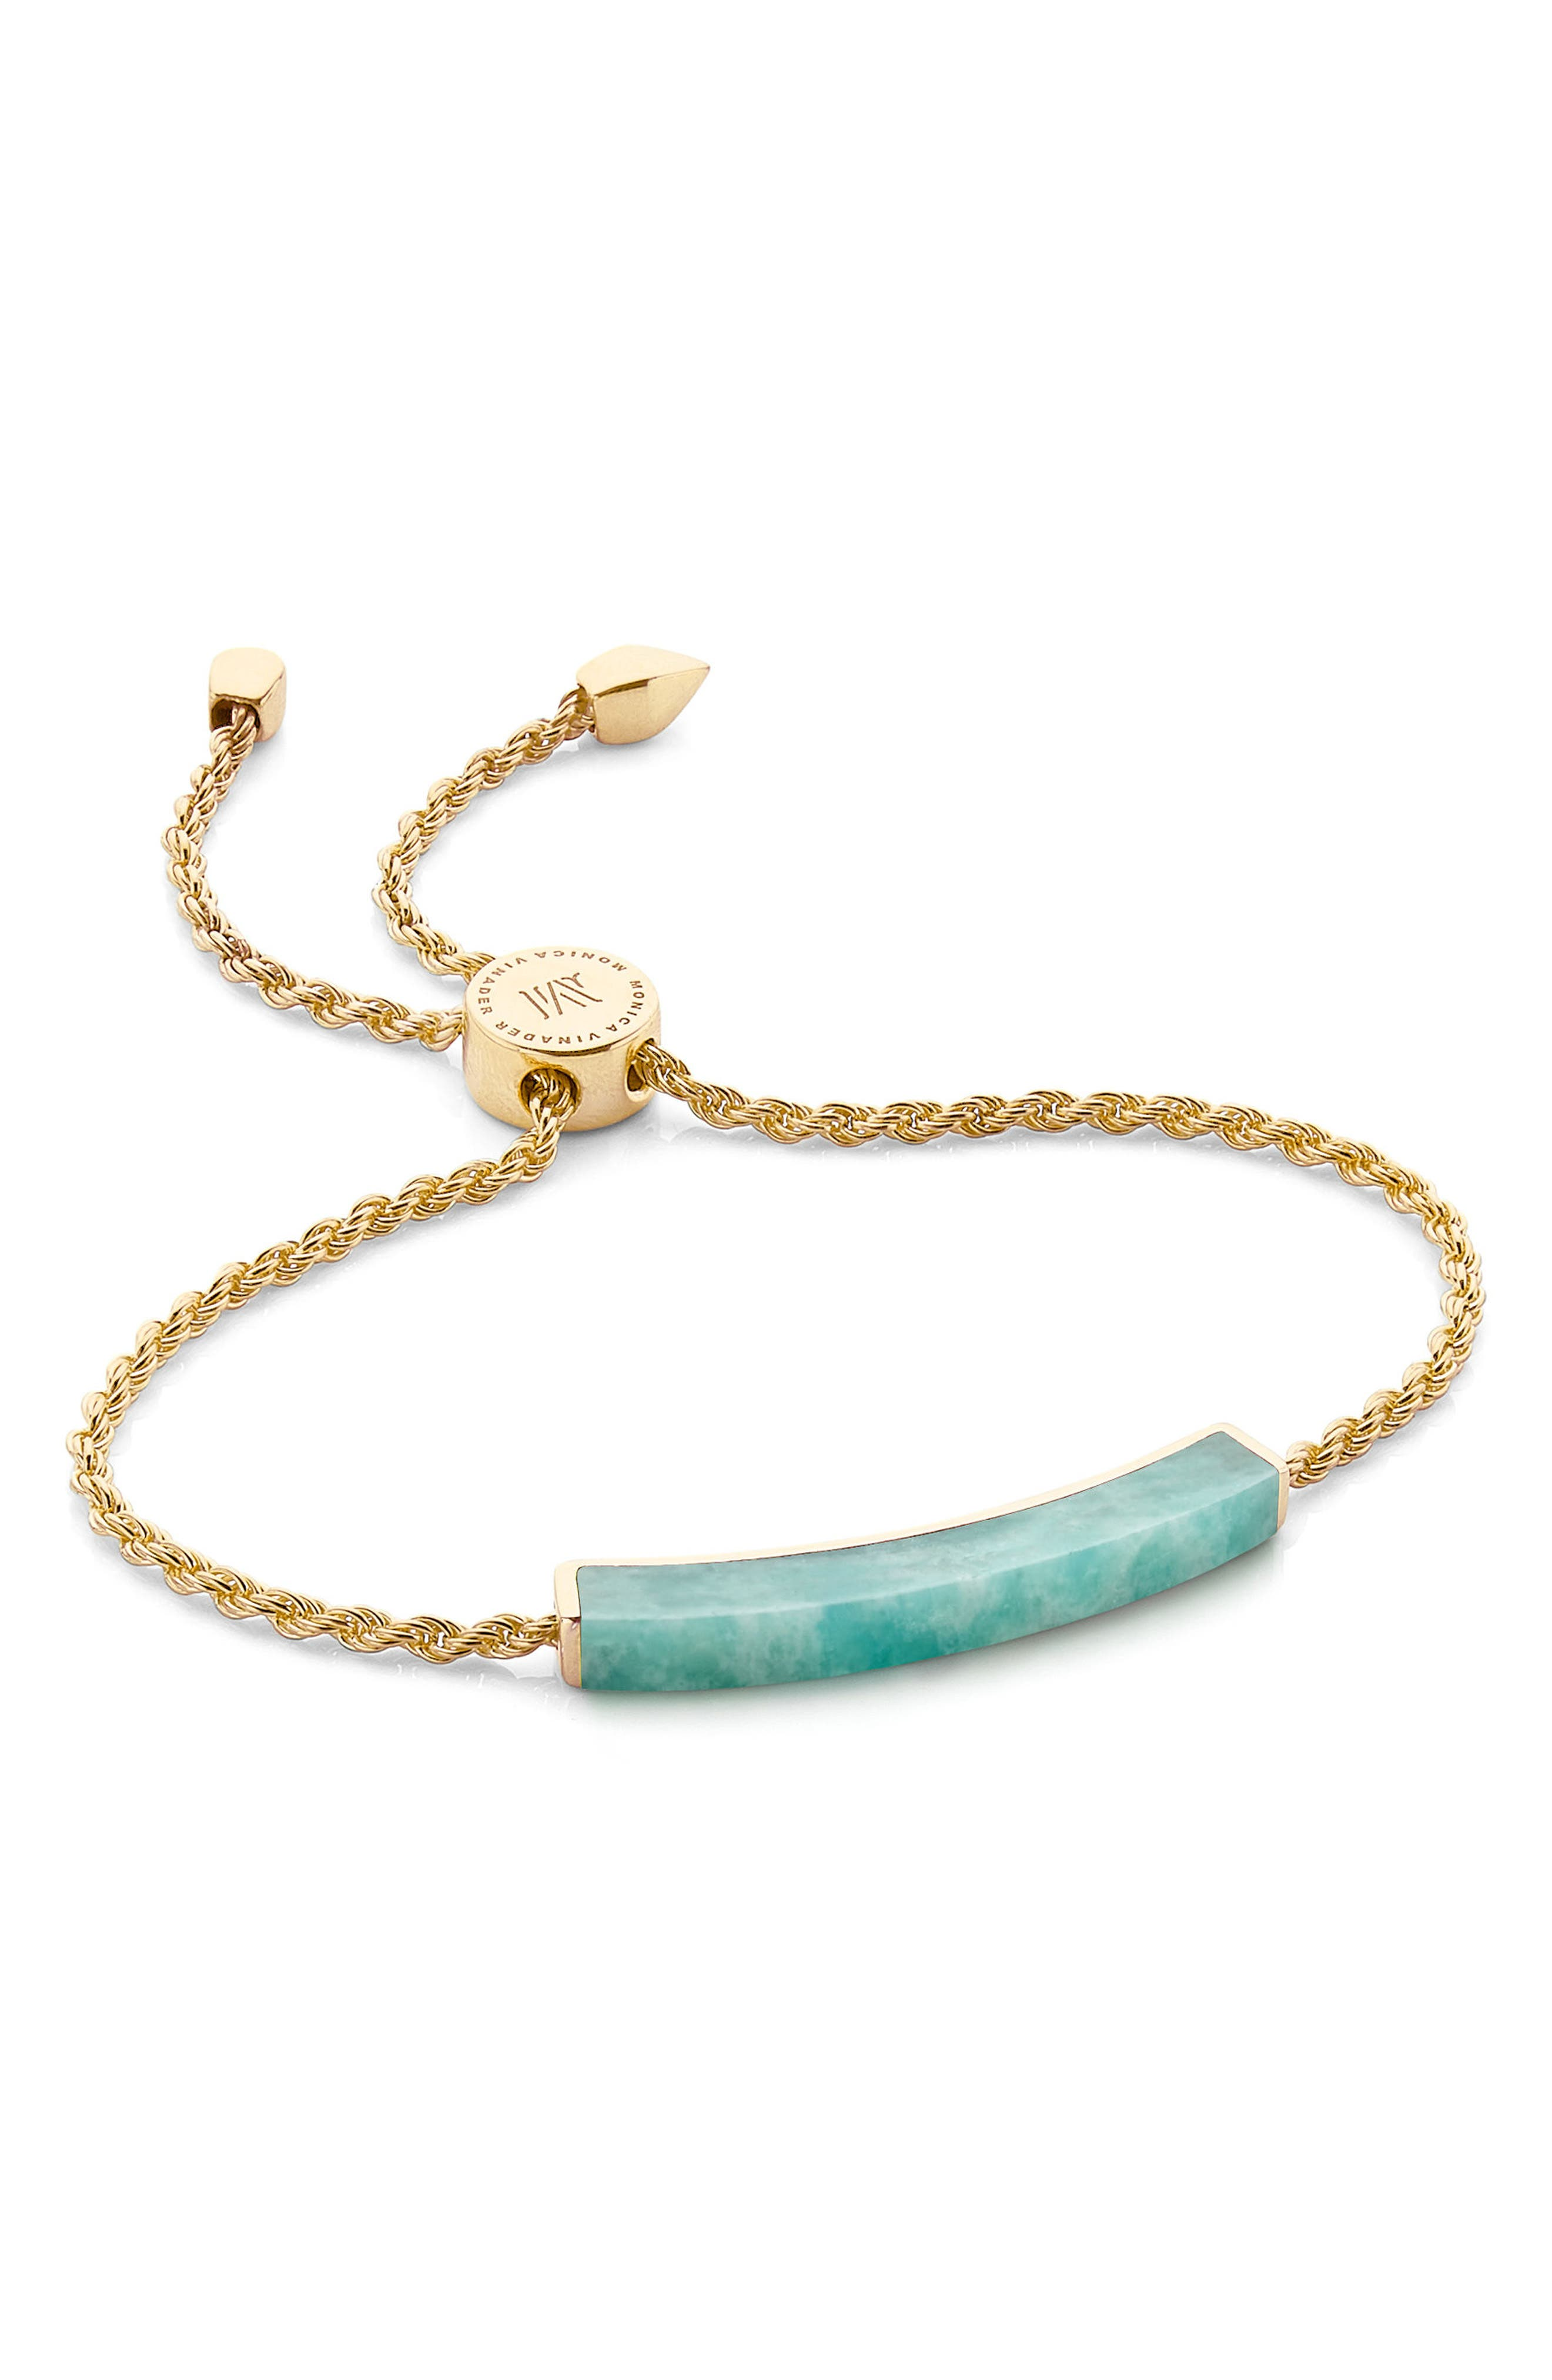 Linear Semiprecious Stone Friendship Bracelet,                         Main,                         color, GOLD/ AMAZONITE